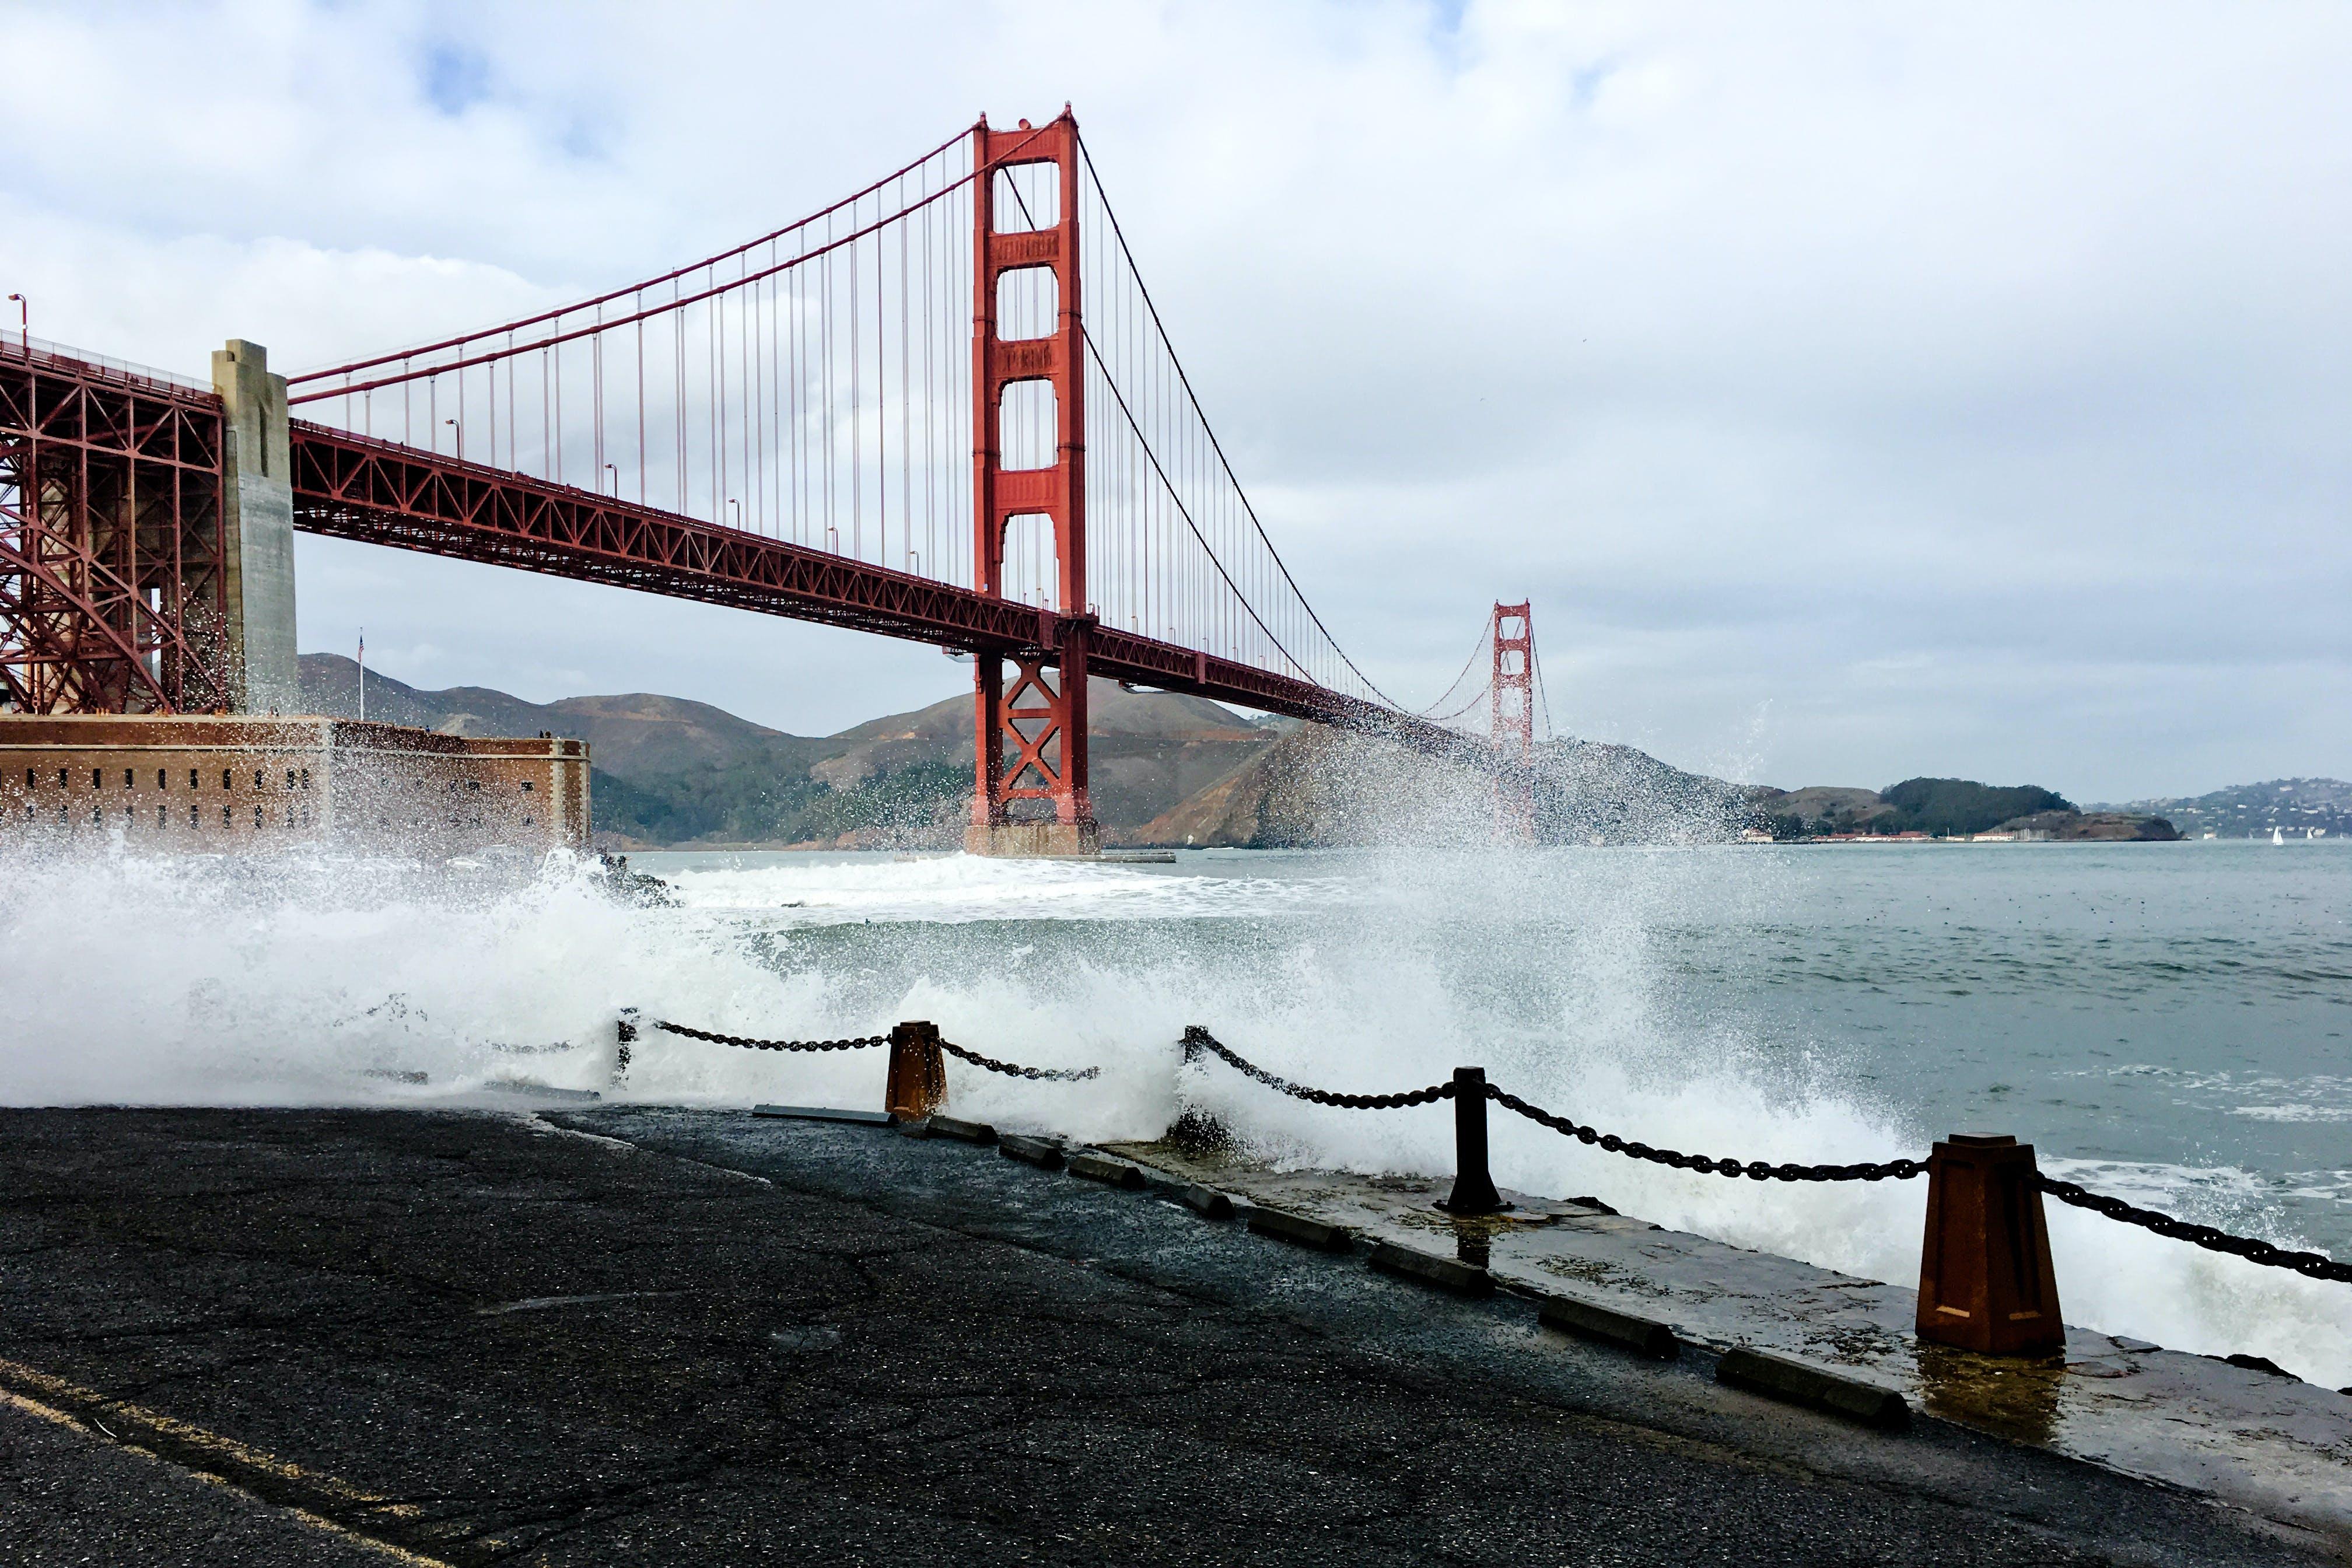 Architectural Photography of Golden Gate Bridge, San Francisco